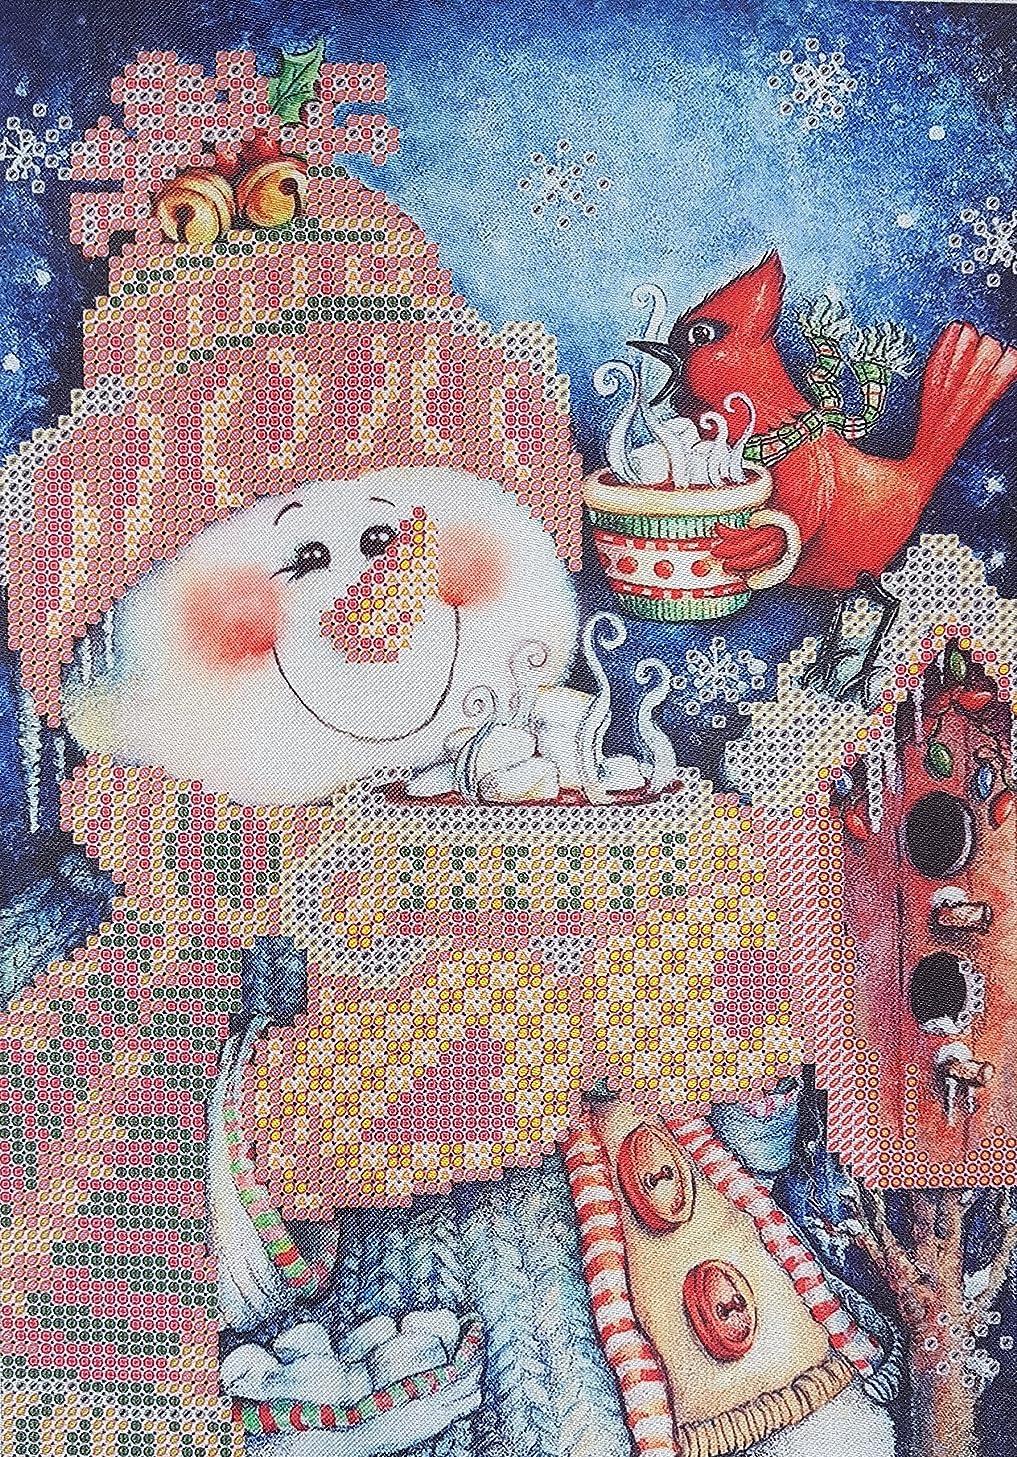 Bead Embroidery Kits Merry Christmas Snowman Needlepoint Pattern Winter Wall Decor Beaded Crossstitch kit Christmas Wall Art Bordado Broderie Perle